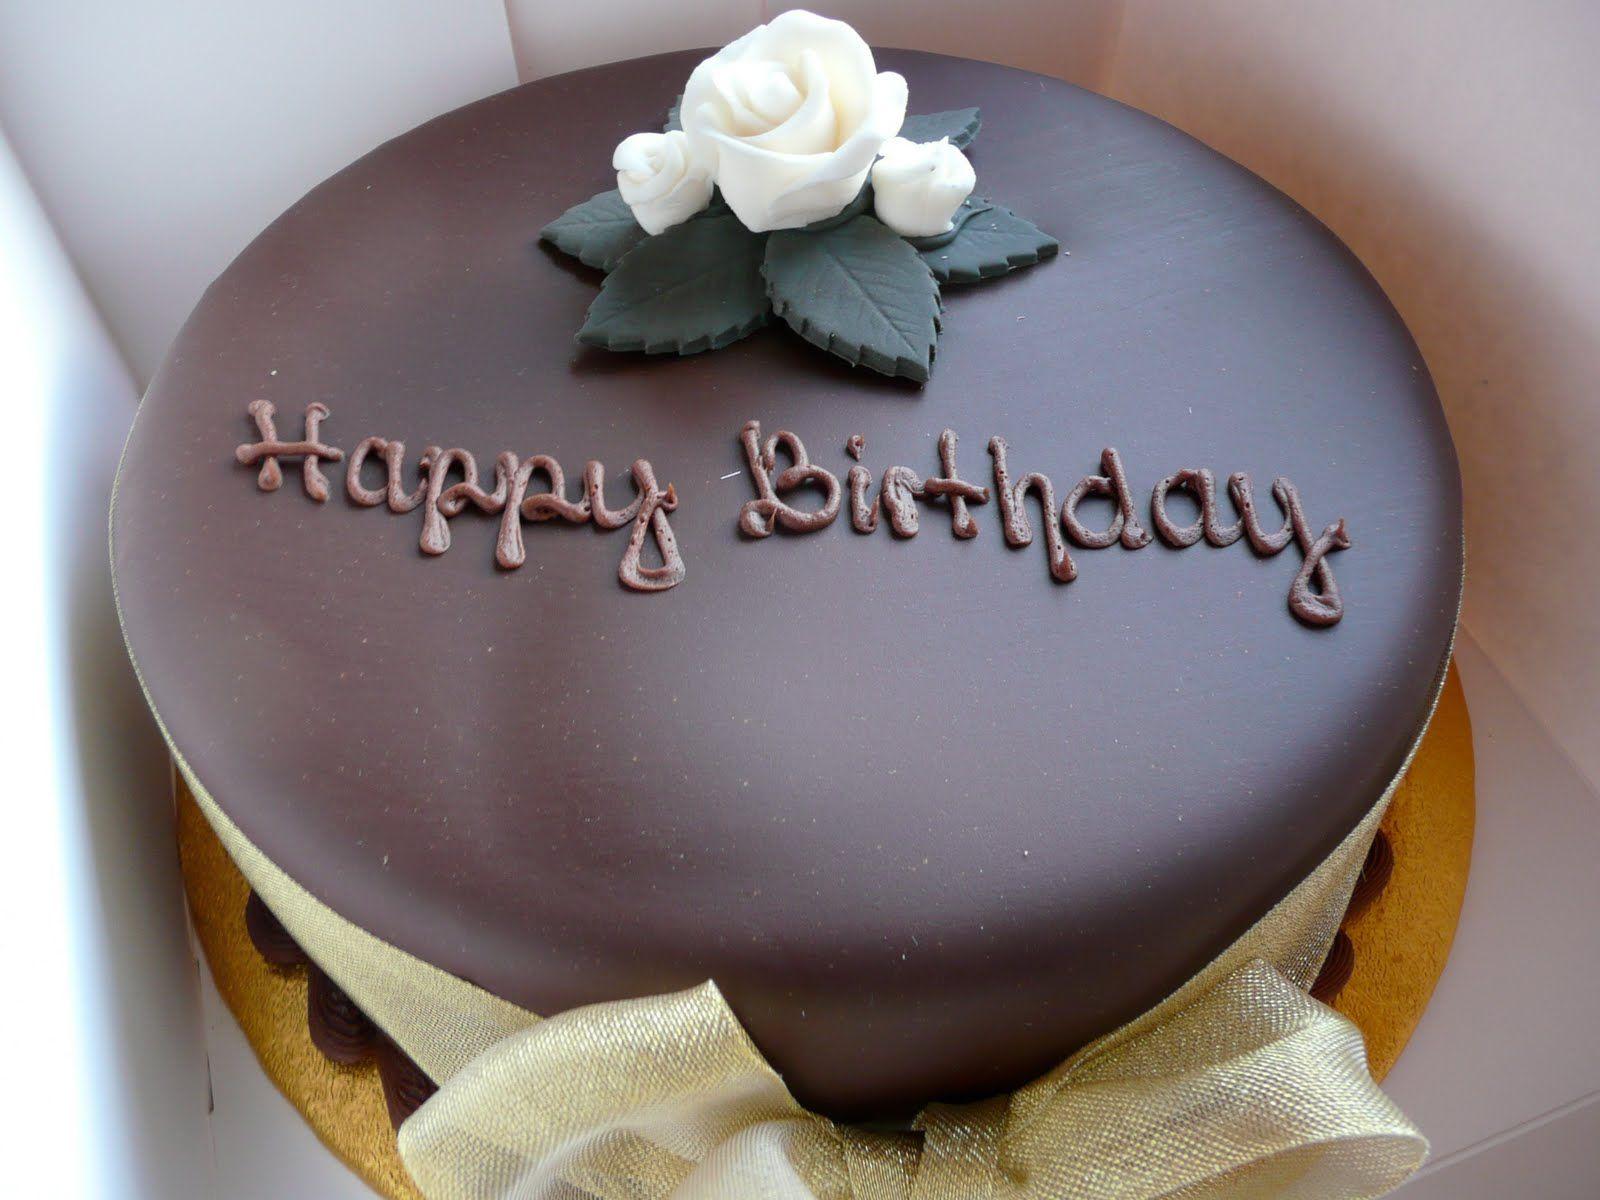 Happy Birthday Cake Photos Hd Wallpaper Foodie Inspiration Happy